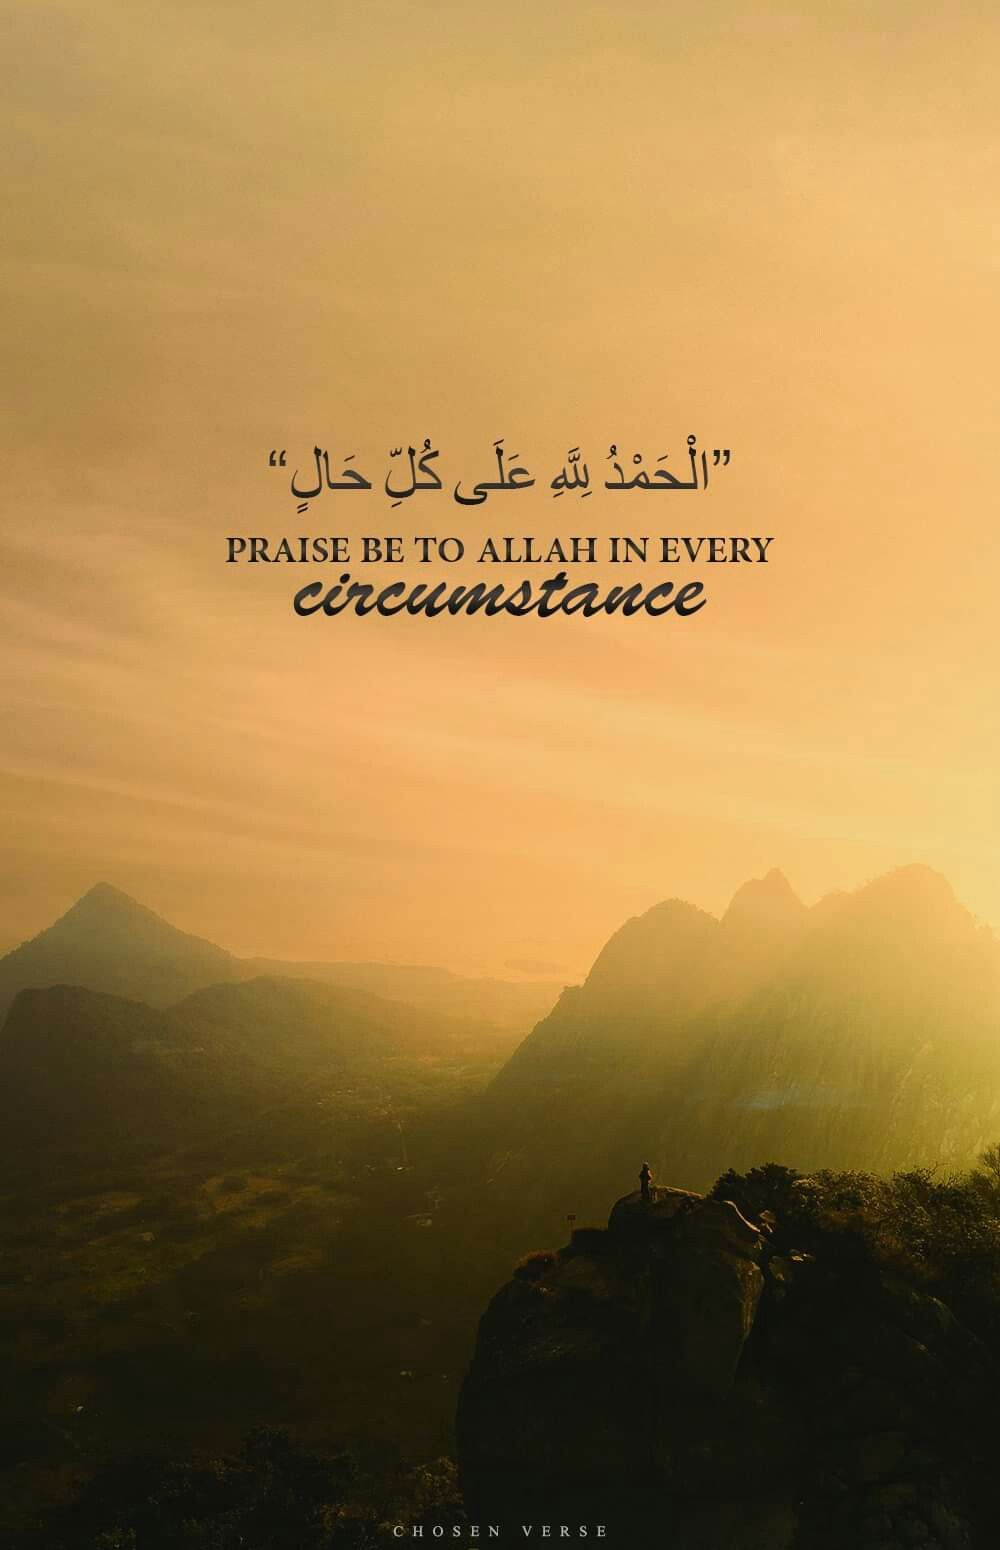 الحمدلله على كل حال Beautiful Names Of Allah Islamic Quotes Meaningful Names